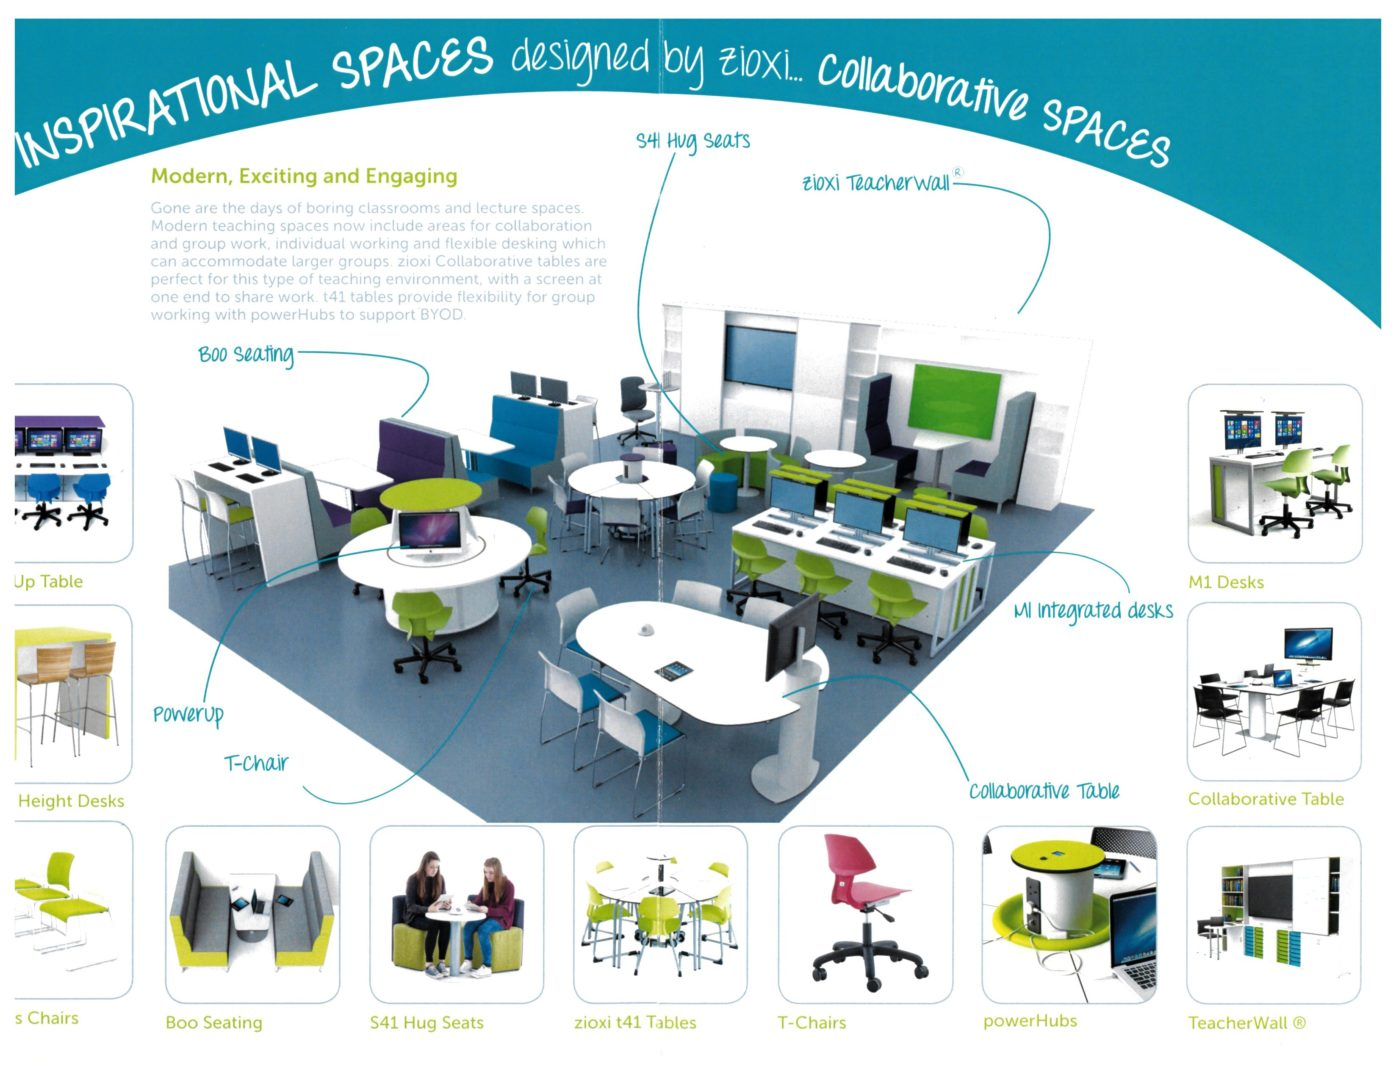 Espace collaboratif collaborative spaces